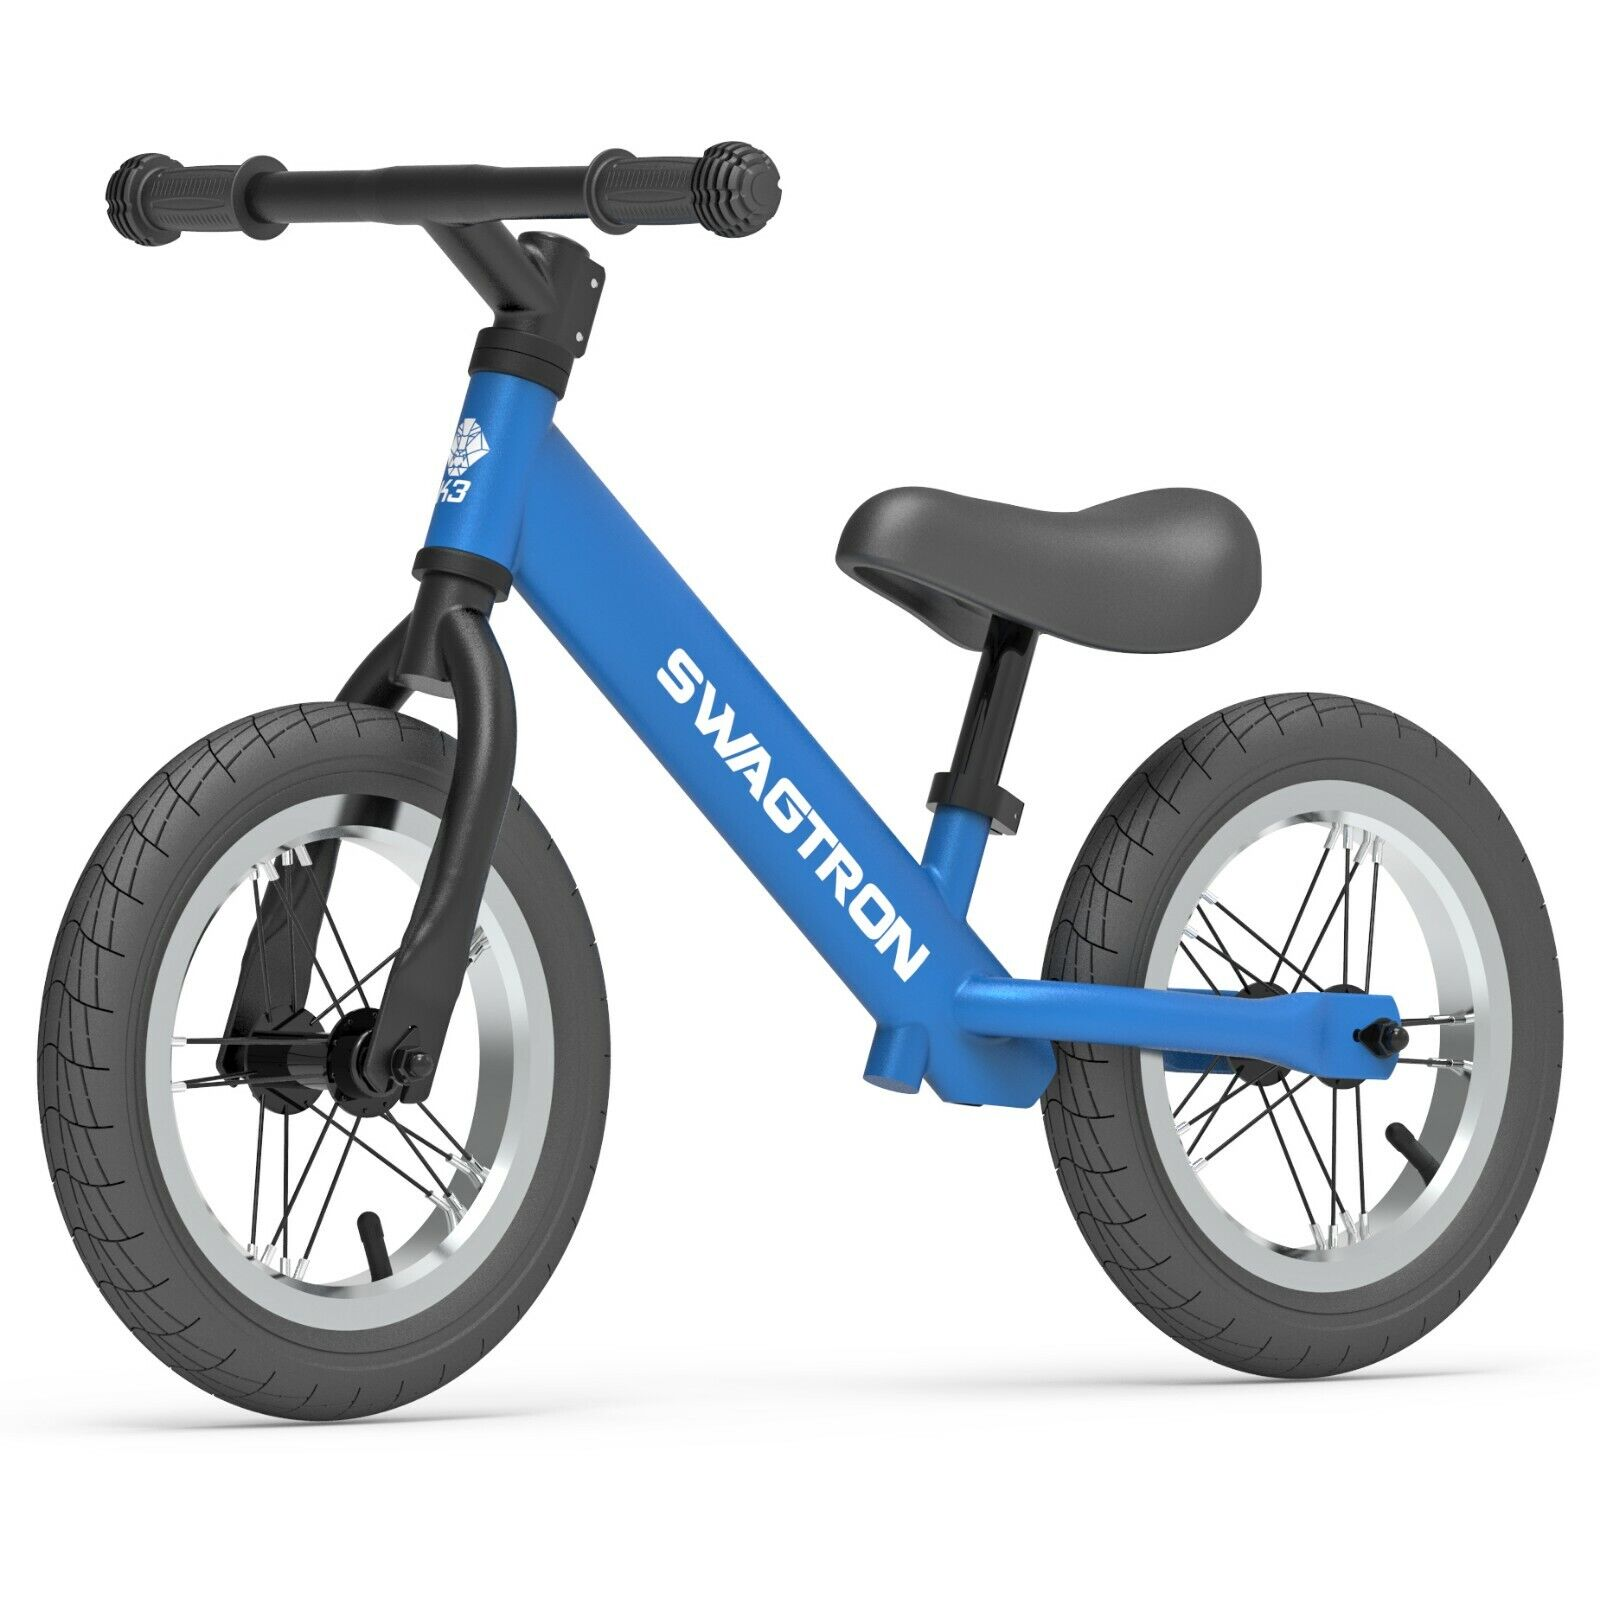 "Swagtron K3 12"" No-Pedal Balance Bike for Kids Blue"